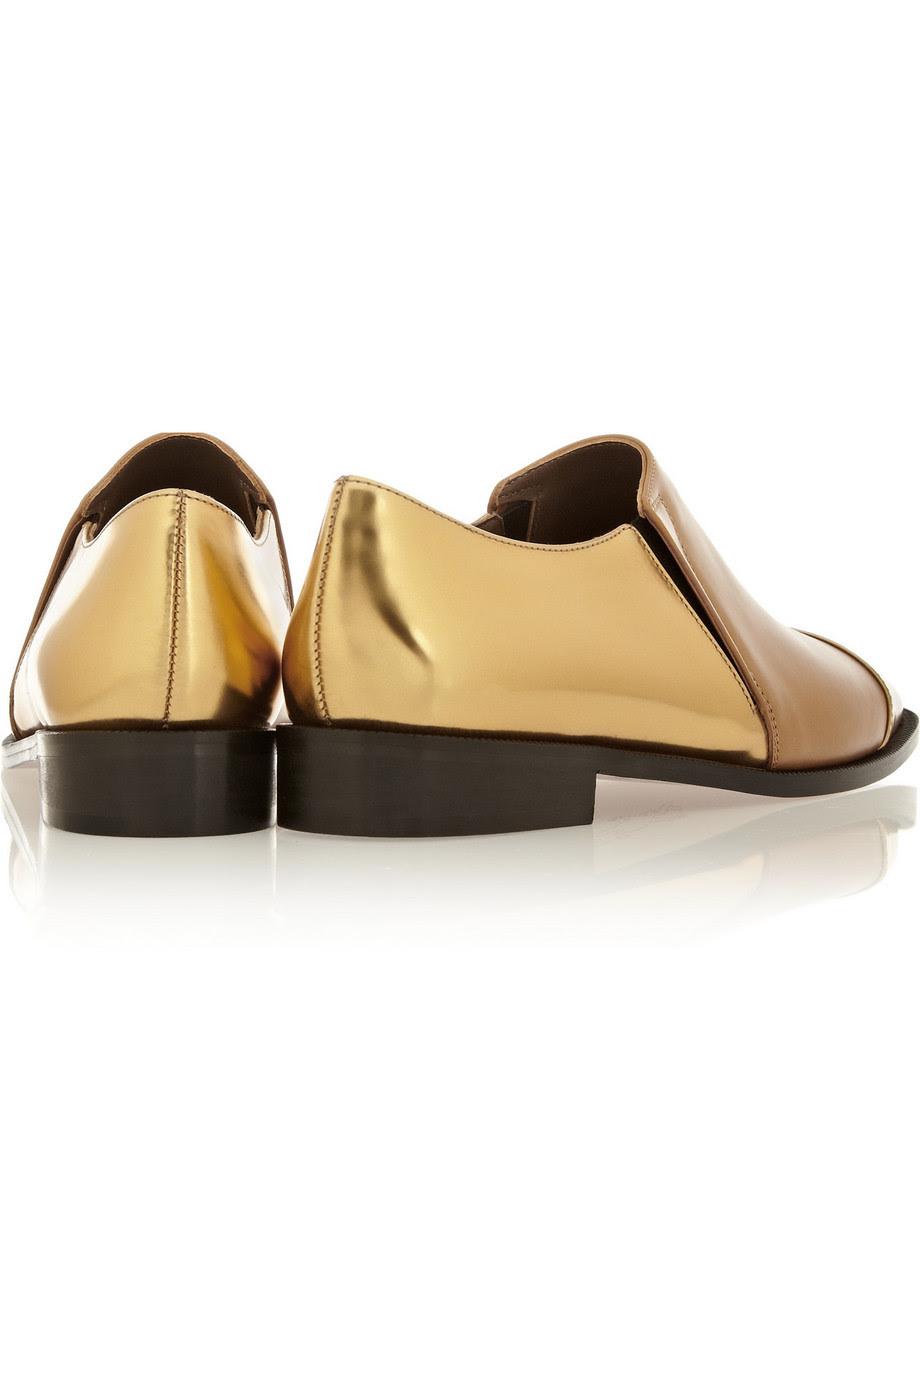 Do Marni Shoes Run True To Size